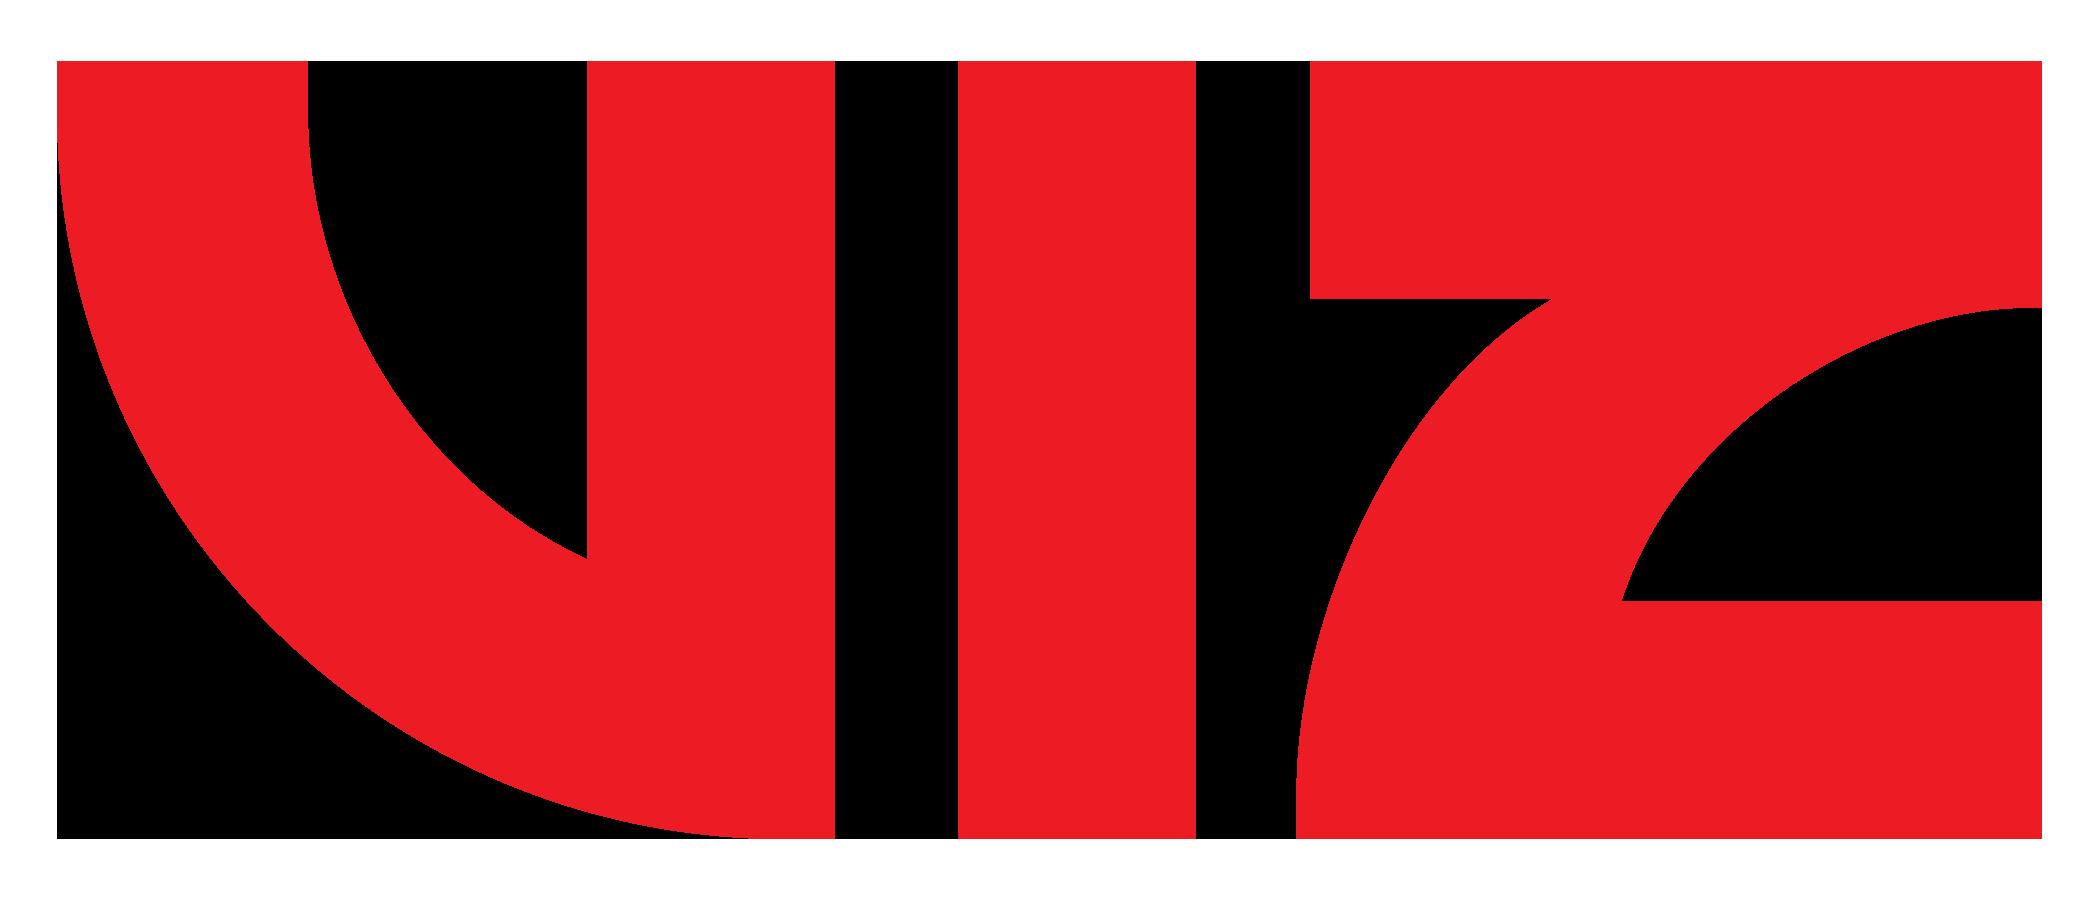 Viz Corporate